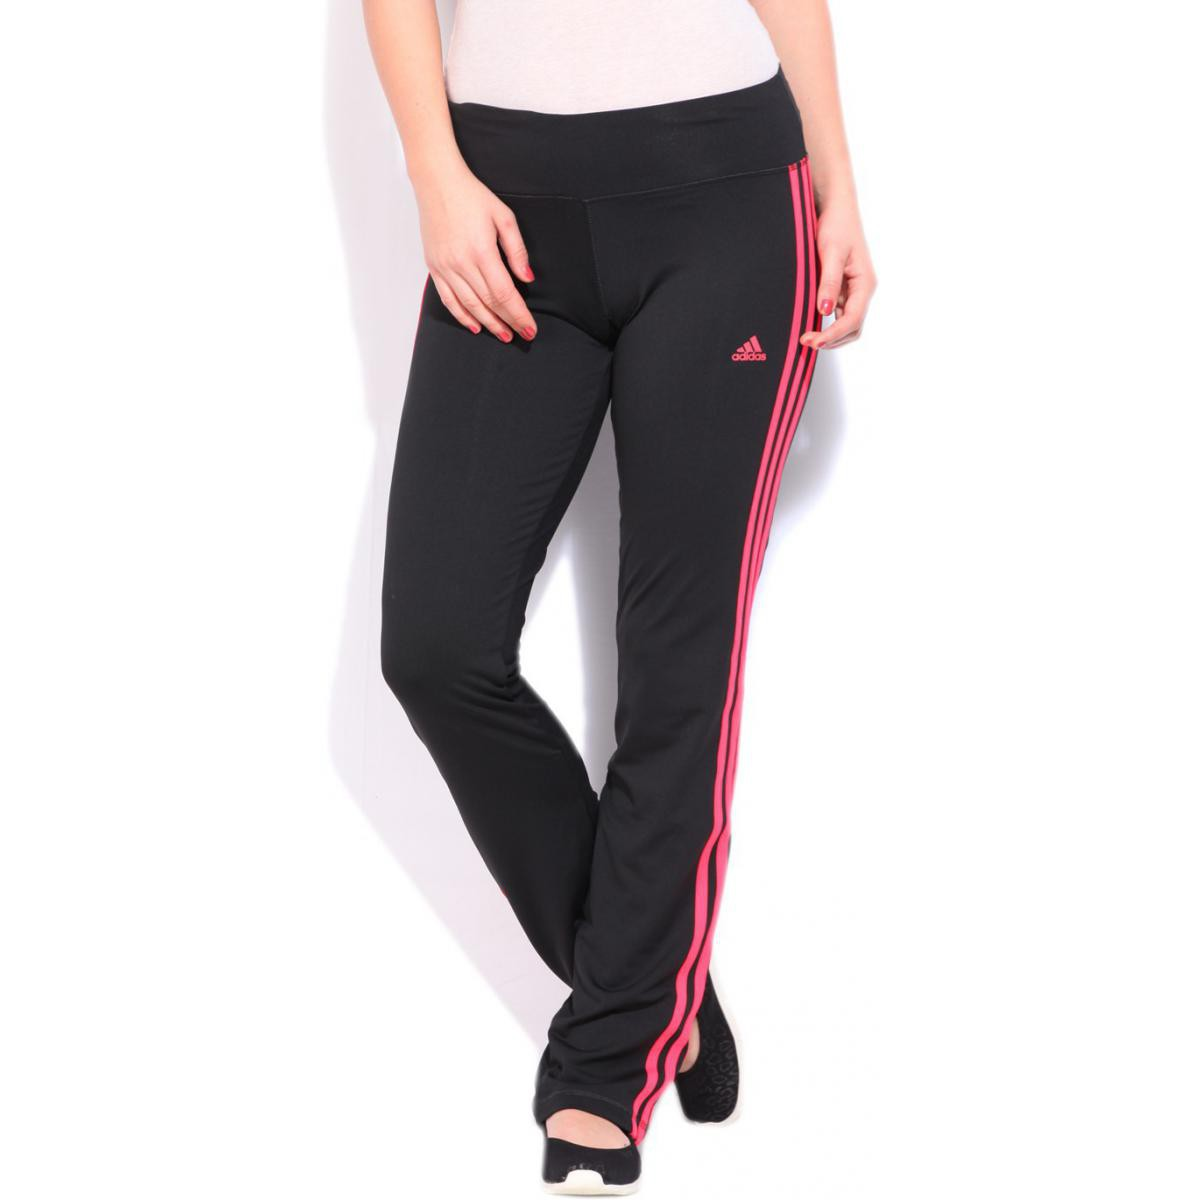 pantalon de jogging adidas femme